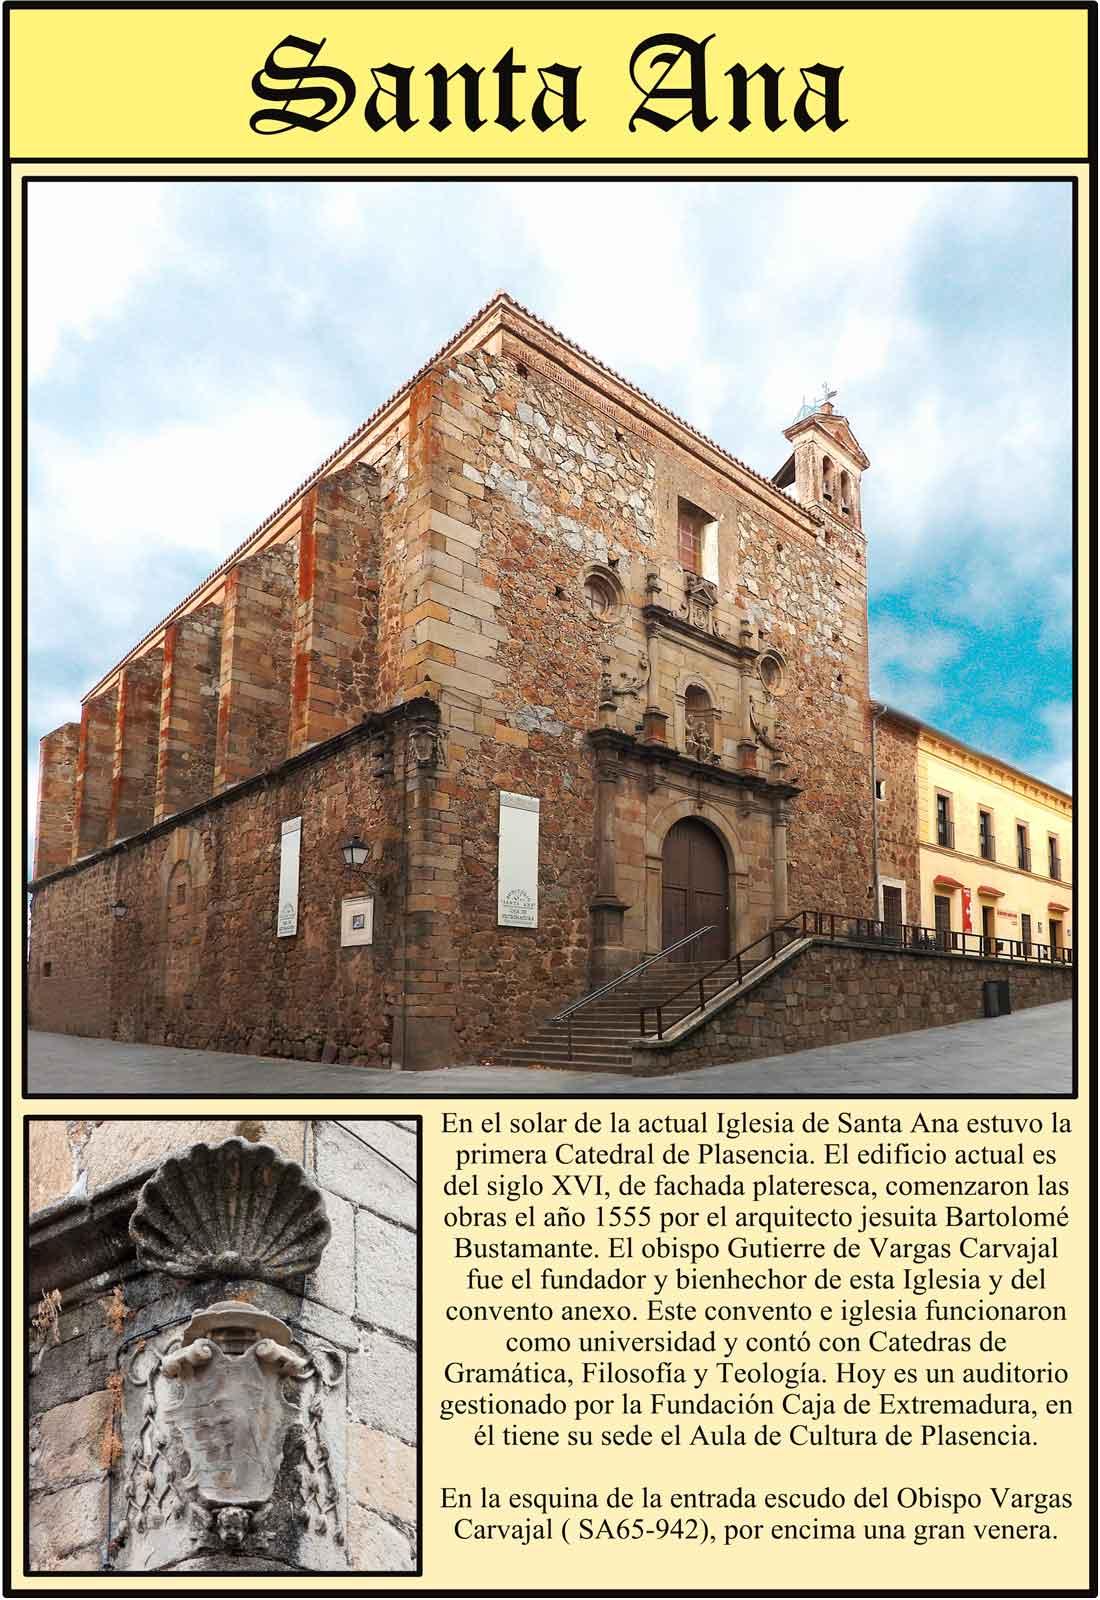 Plasencia Iglesia de Santa Ana Escudo del obispo Gutierre de Vargas Carvajal